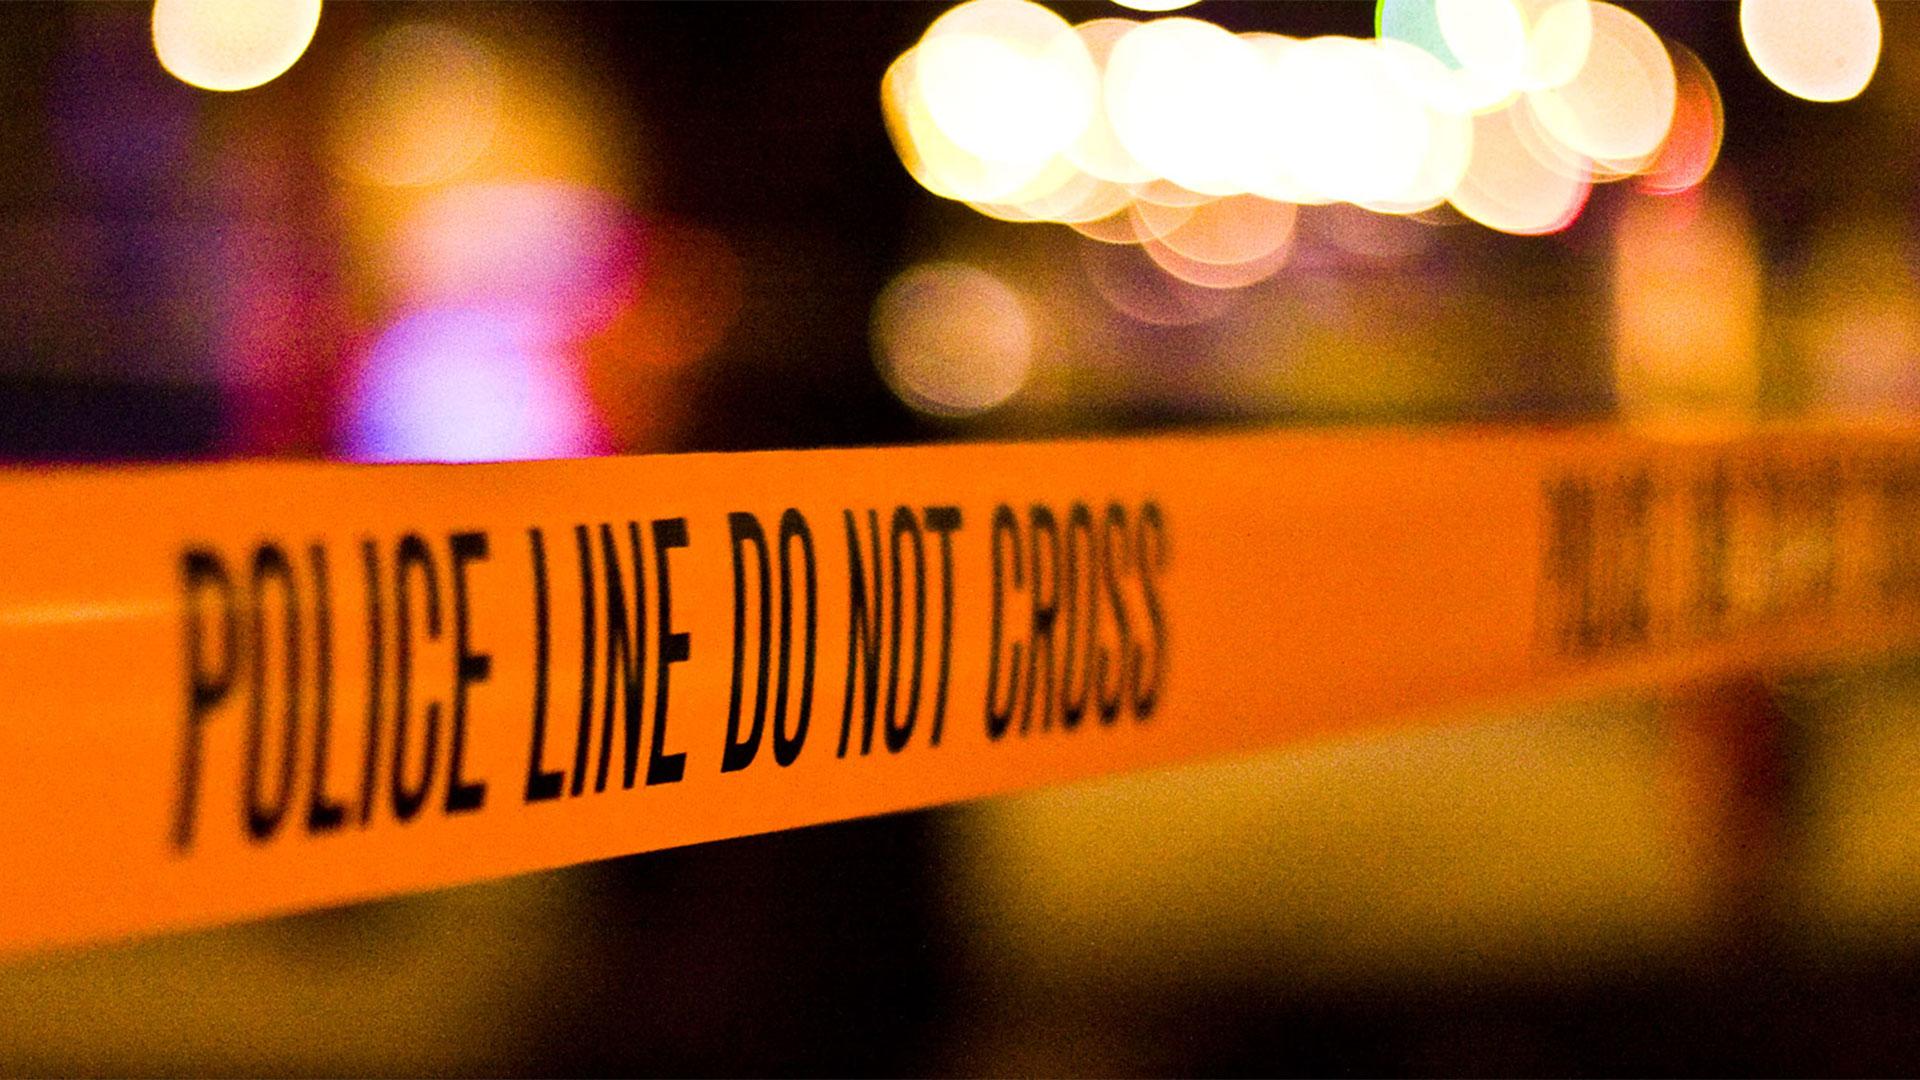 KELO police tape NIGHT lights